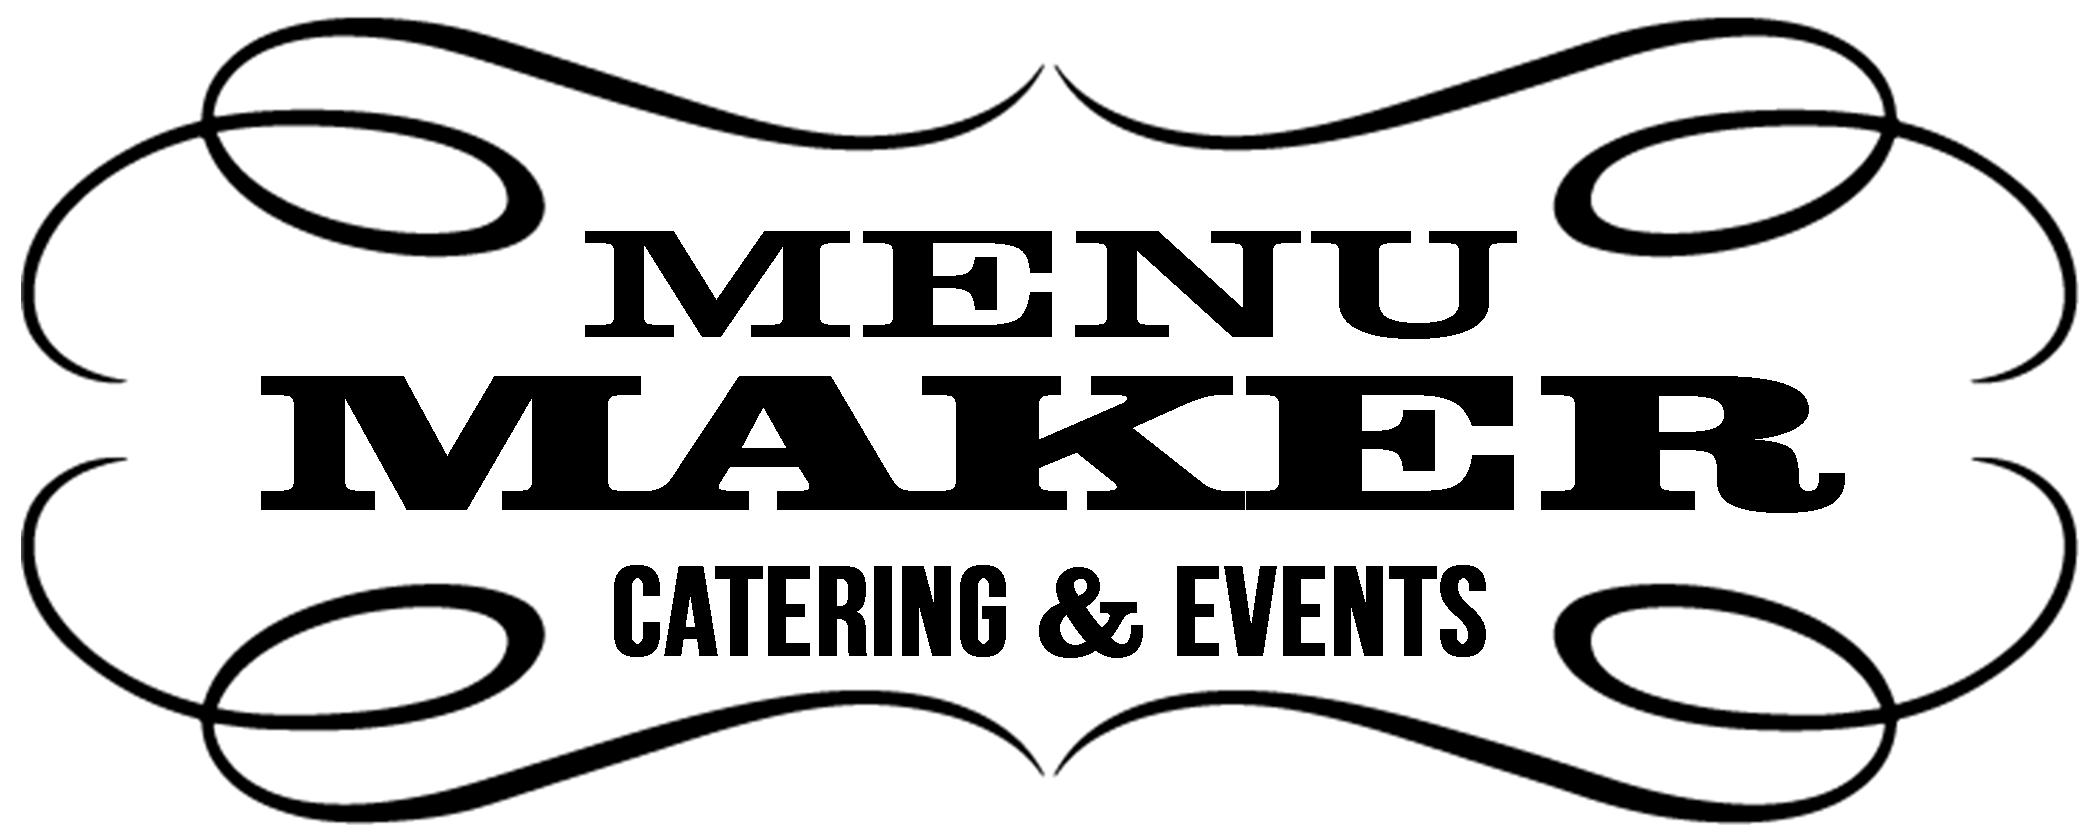 Menu Maker Logo Catering Events